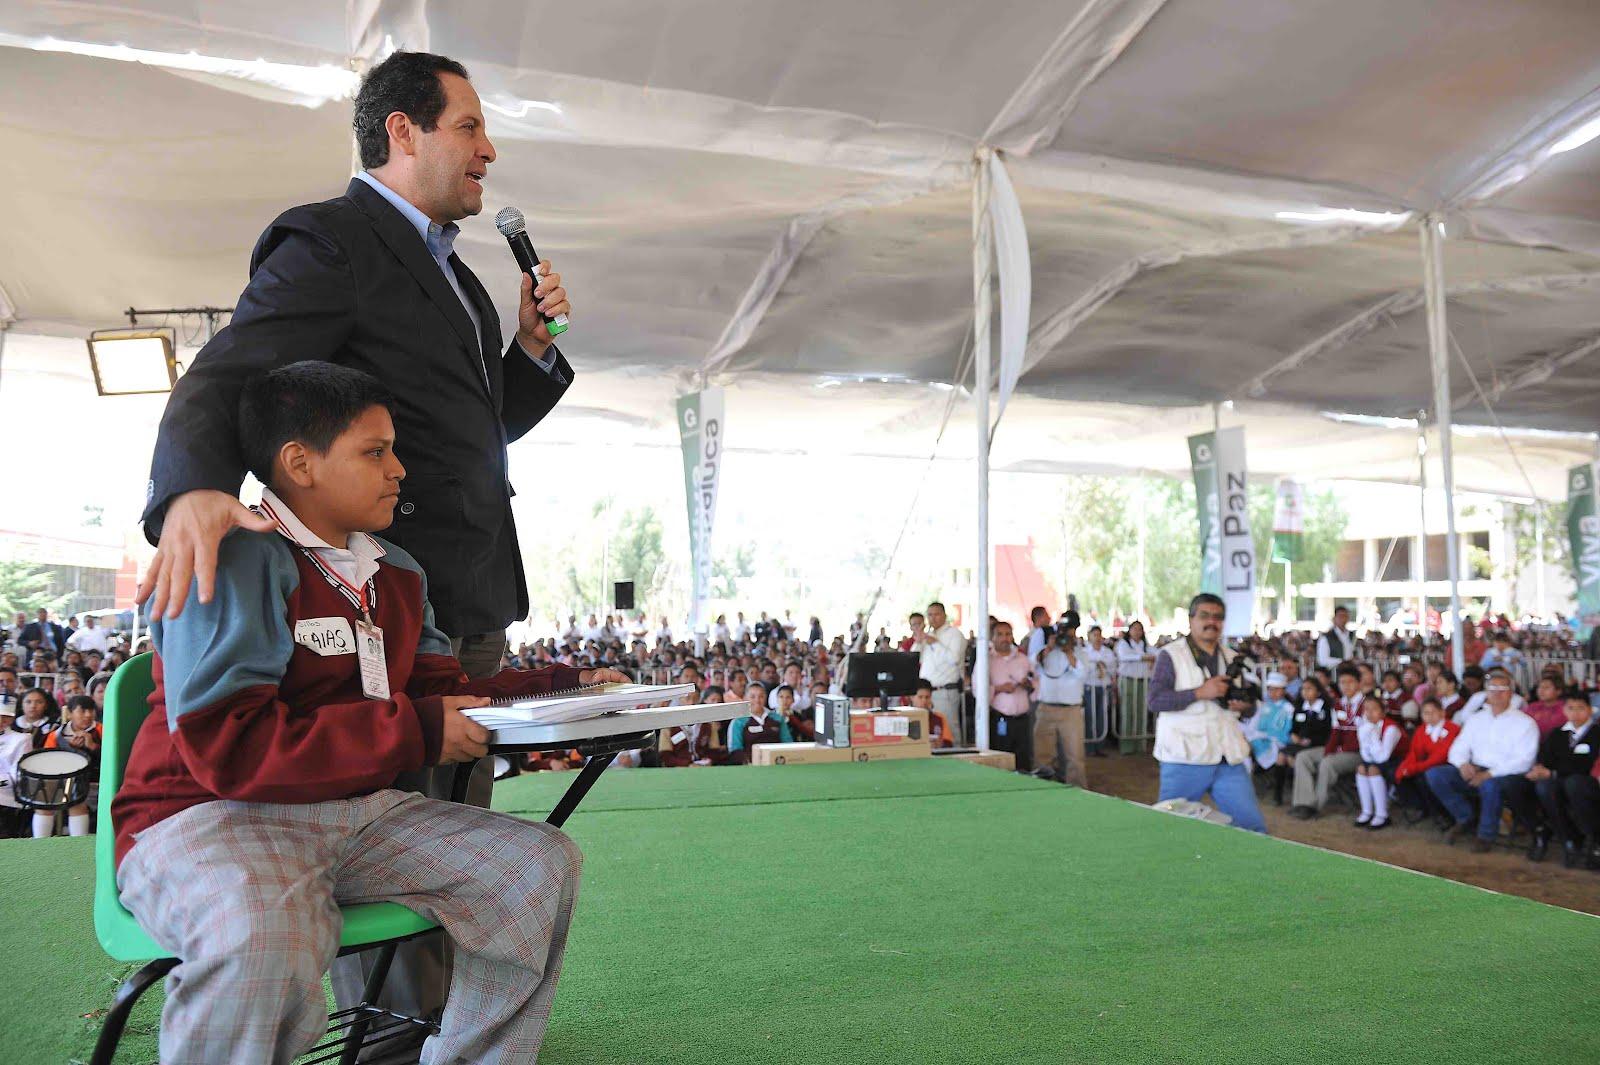 Cronista de toluca eruviel vila entrega pupitres for Sillas escolares para zurdos